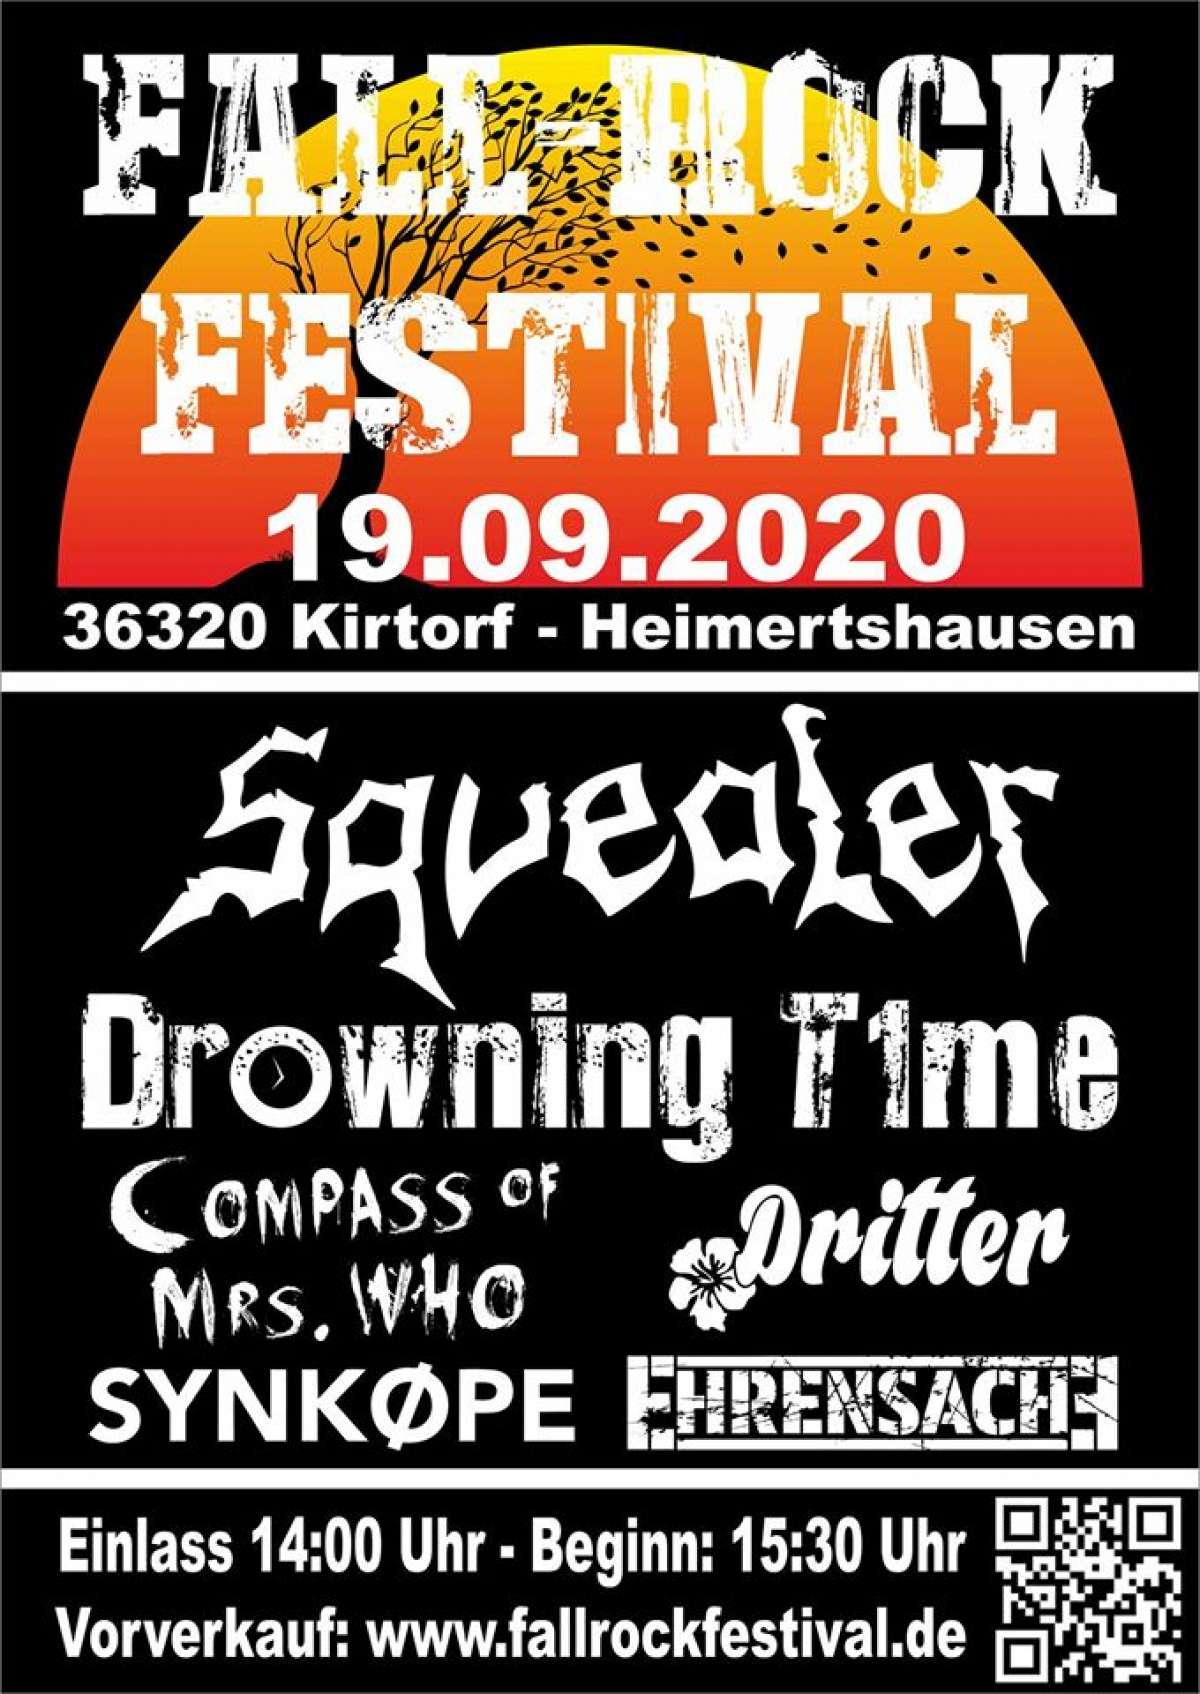 Fall-Rock-Festival - Compass of Mrs. Who, Dritter, Drowning Time, Ehrensache, Squealer, Synkope - Festivalgelände Kirtorf - Kirtorf - Heimertshausen